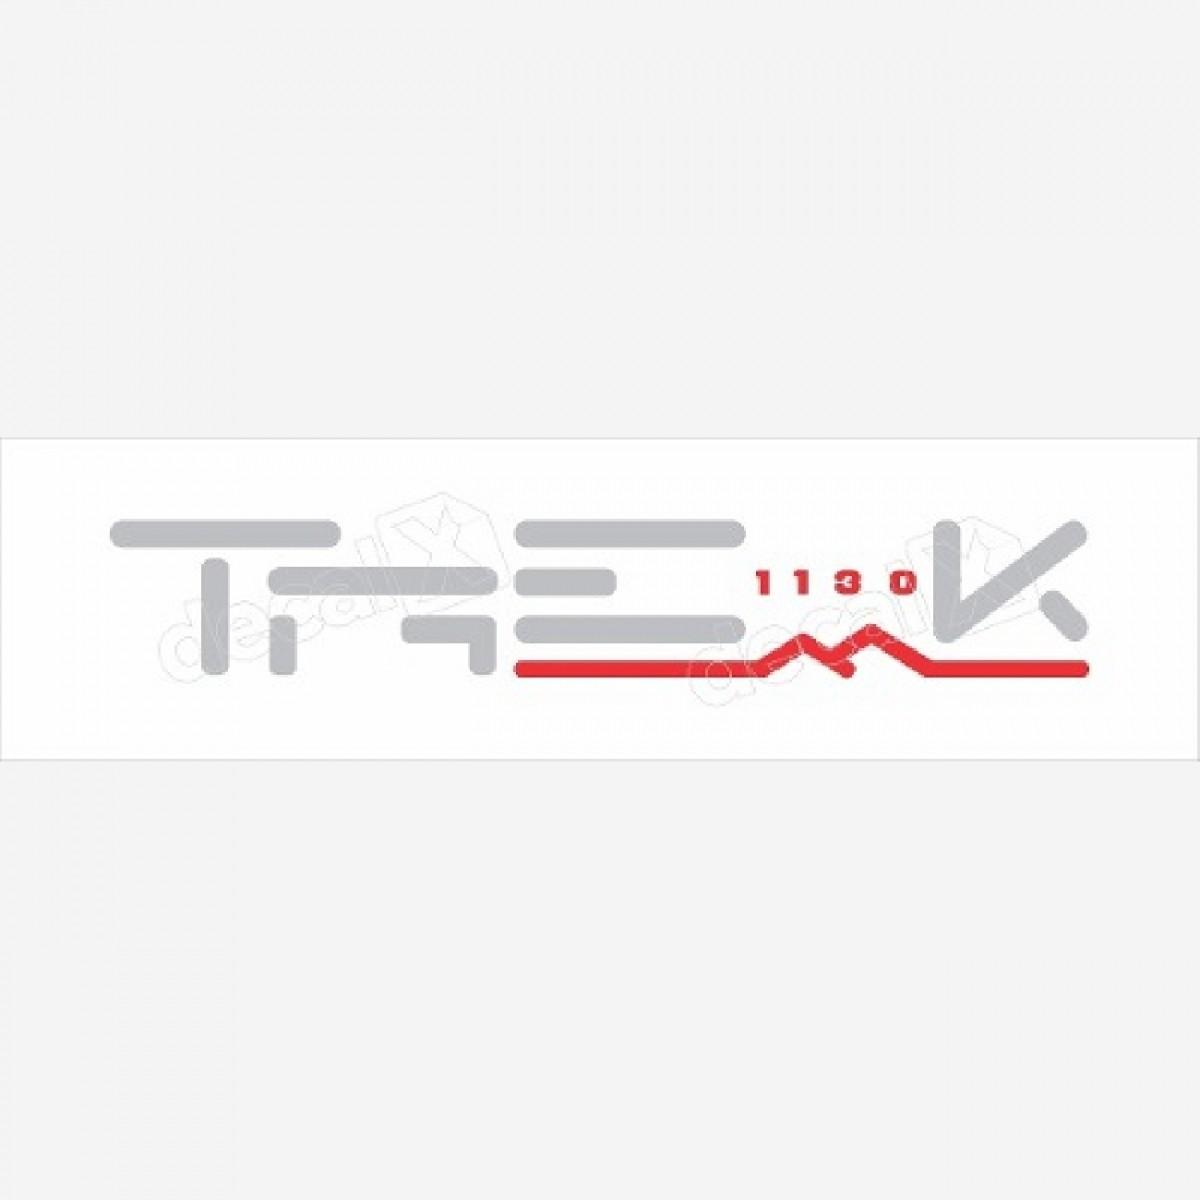 Adesivos Benelli Trek 1130 Decalx